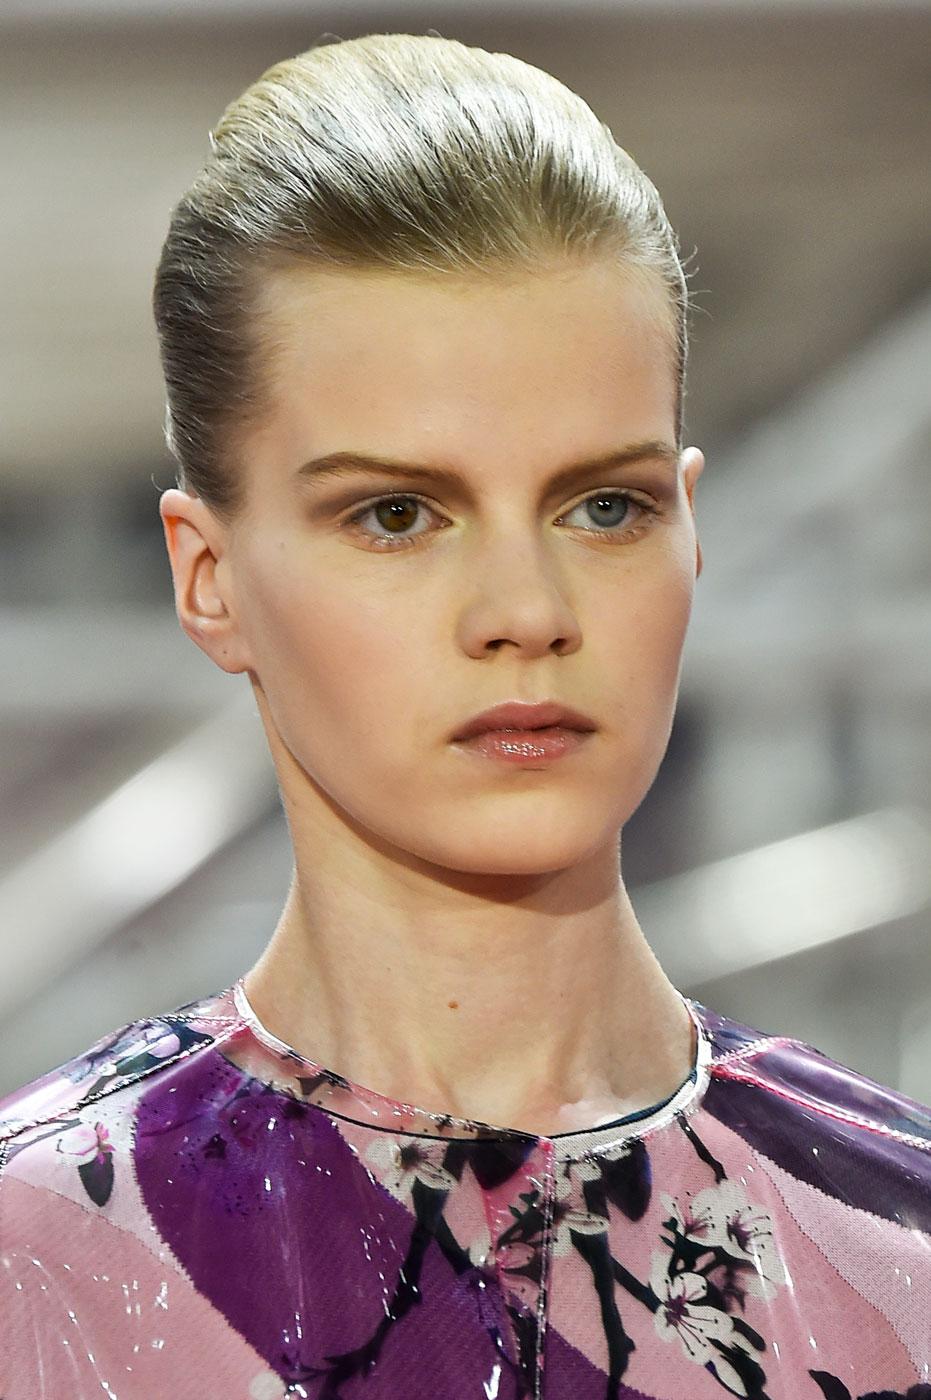 Christian-Dior-fashion-runway-show-close-ups-haute-couture-paris-spring-summer-2015-the-impression-107